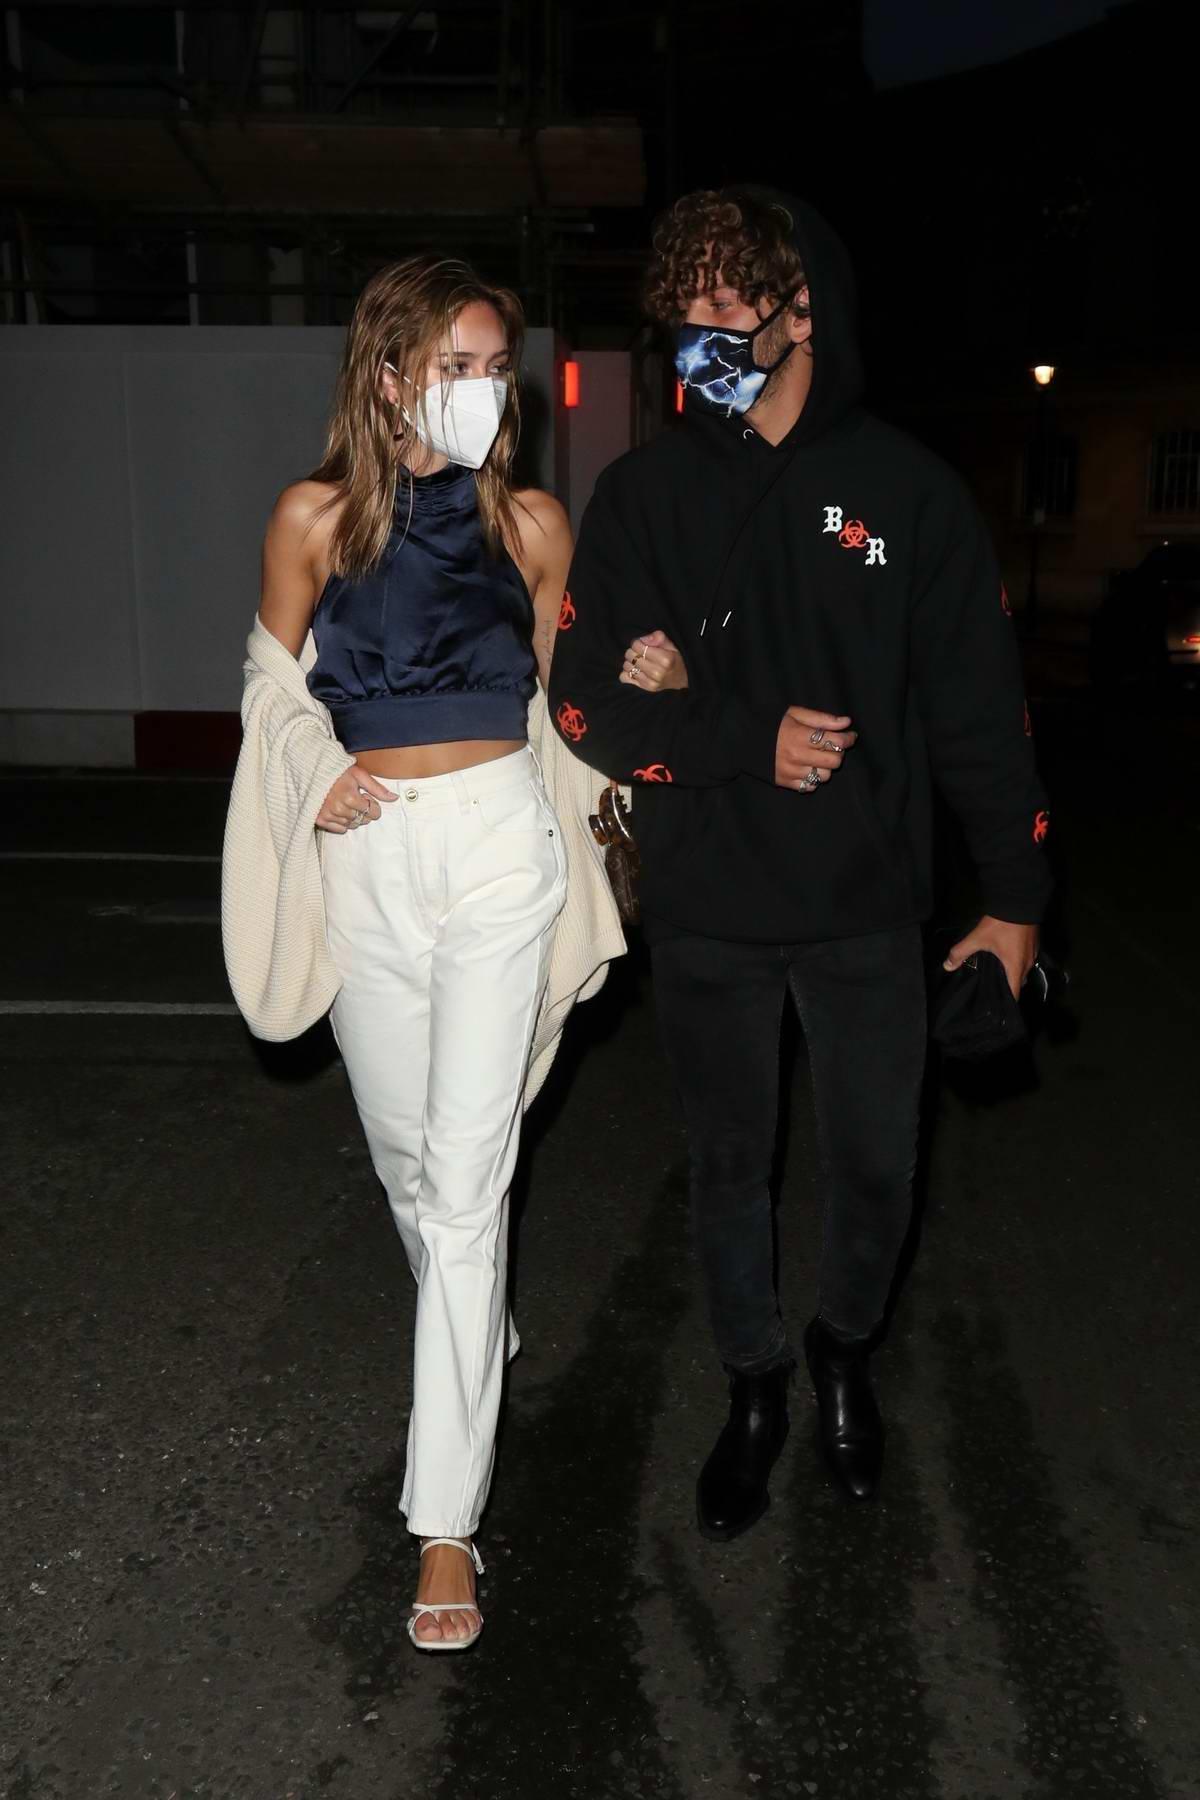 Delilah Hamlin and Eyal Booker seen leaving The Treehouse Hotel in London, UK